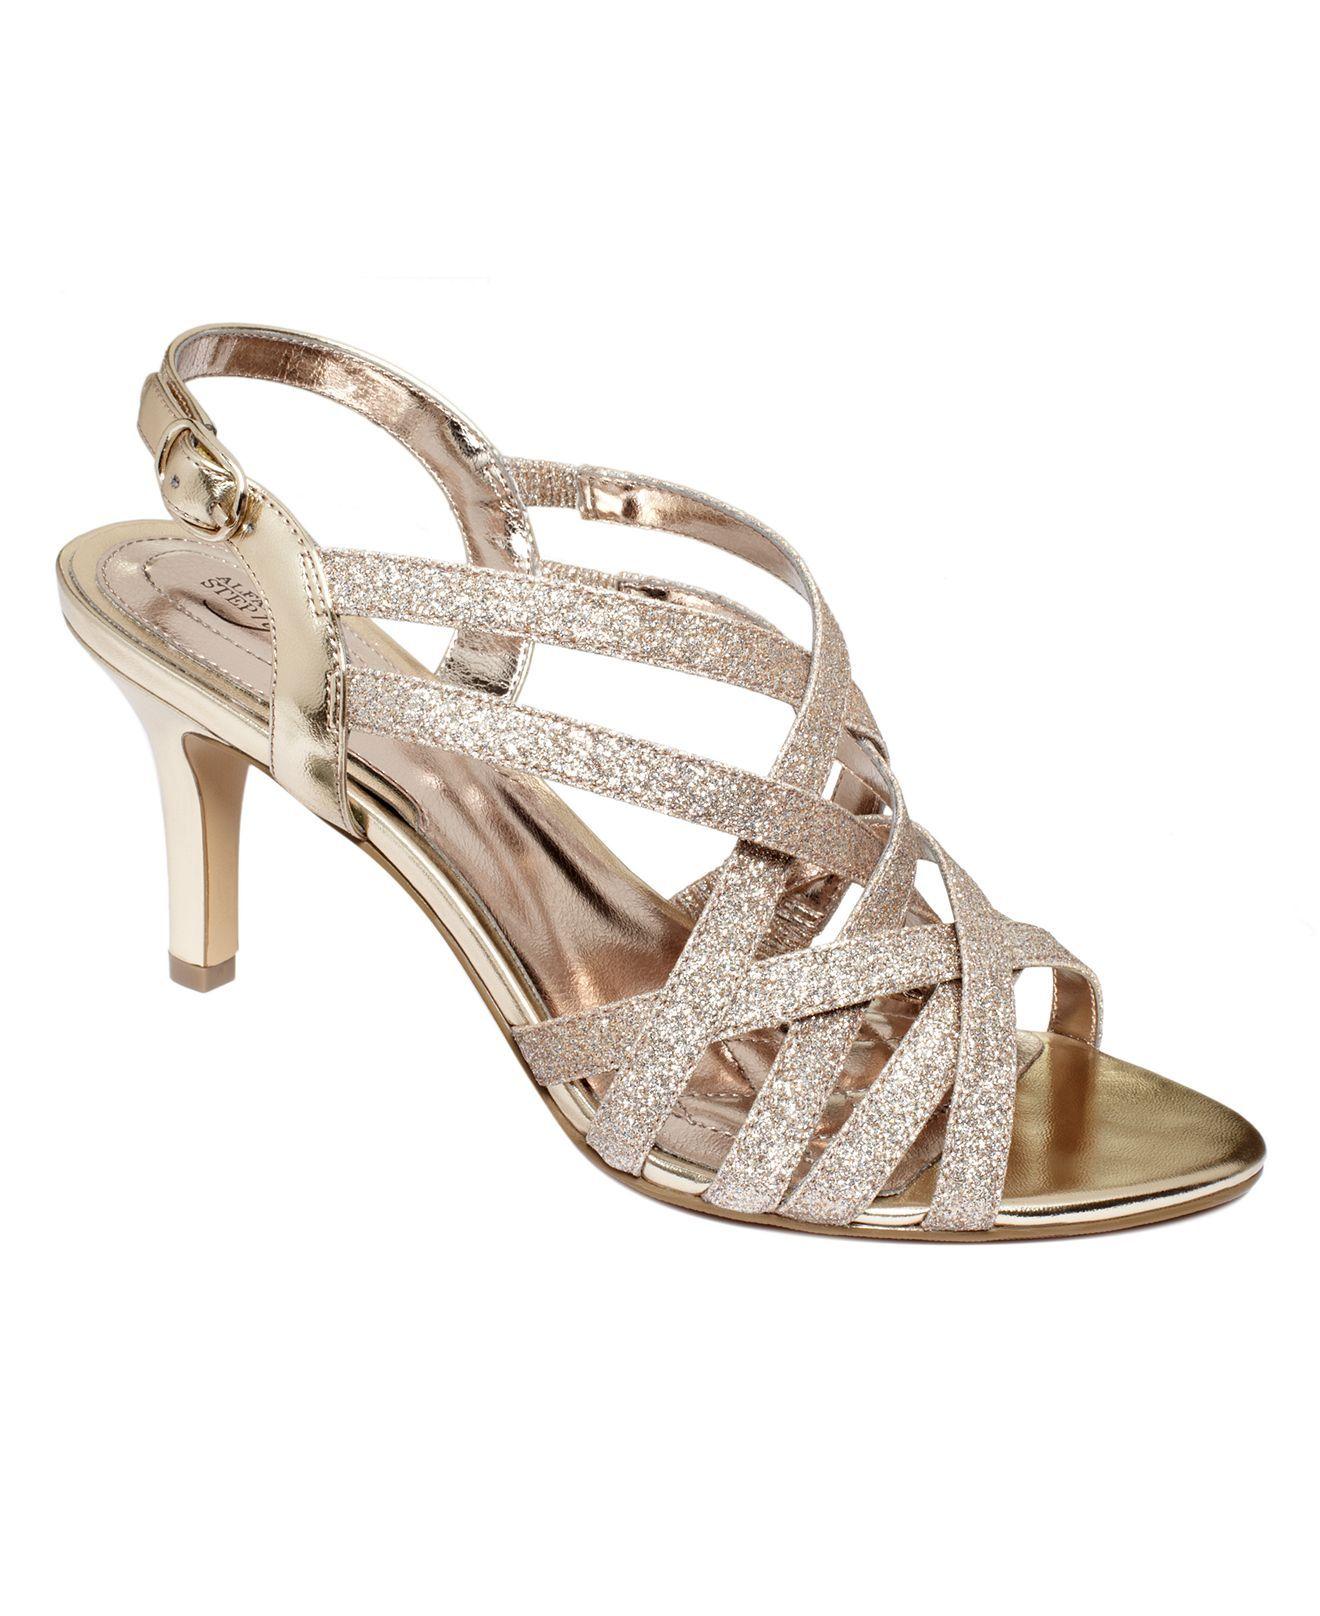 Alfani Womens Shoes Alisa Evening Sandals Evening Bridal Shoes Macys Bridal Shoes Low Heel Evening Sandals Womens Evening Shoes